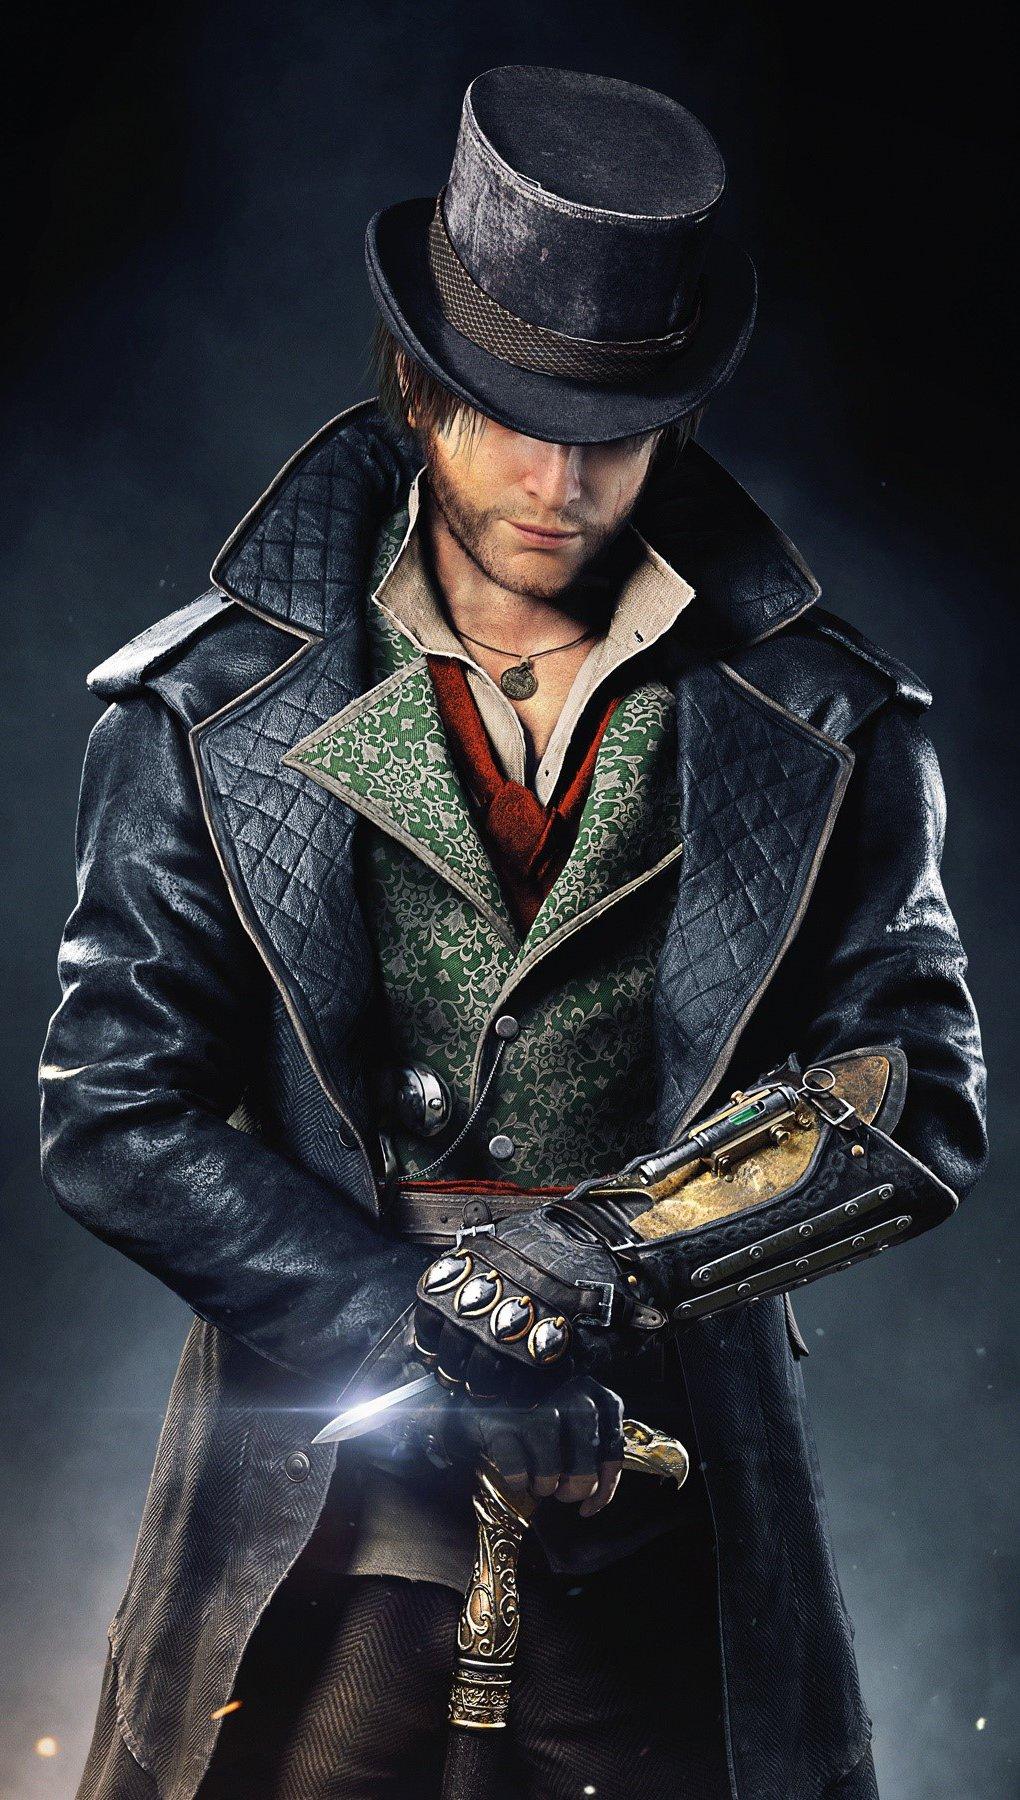 Fondos de pantalla Jacob Frye Assassins Creed Syndicate Vertical